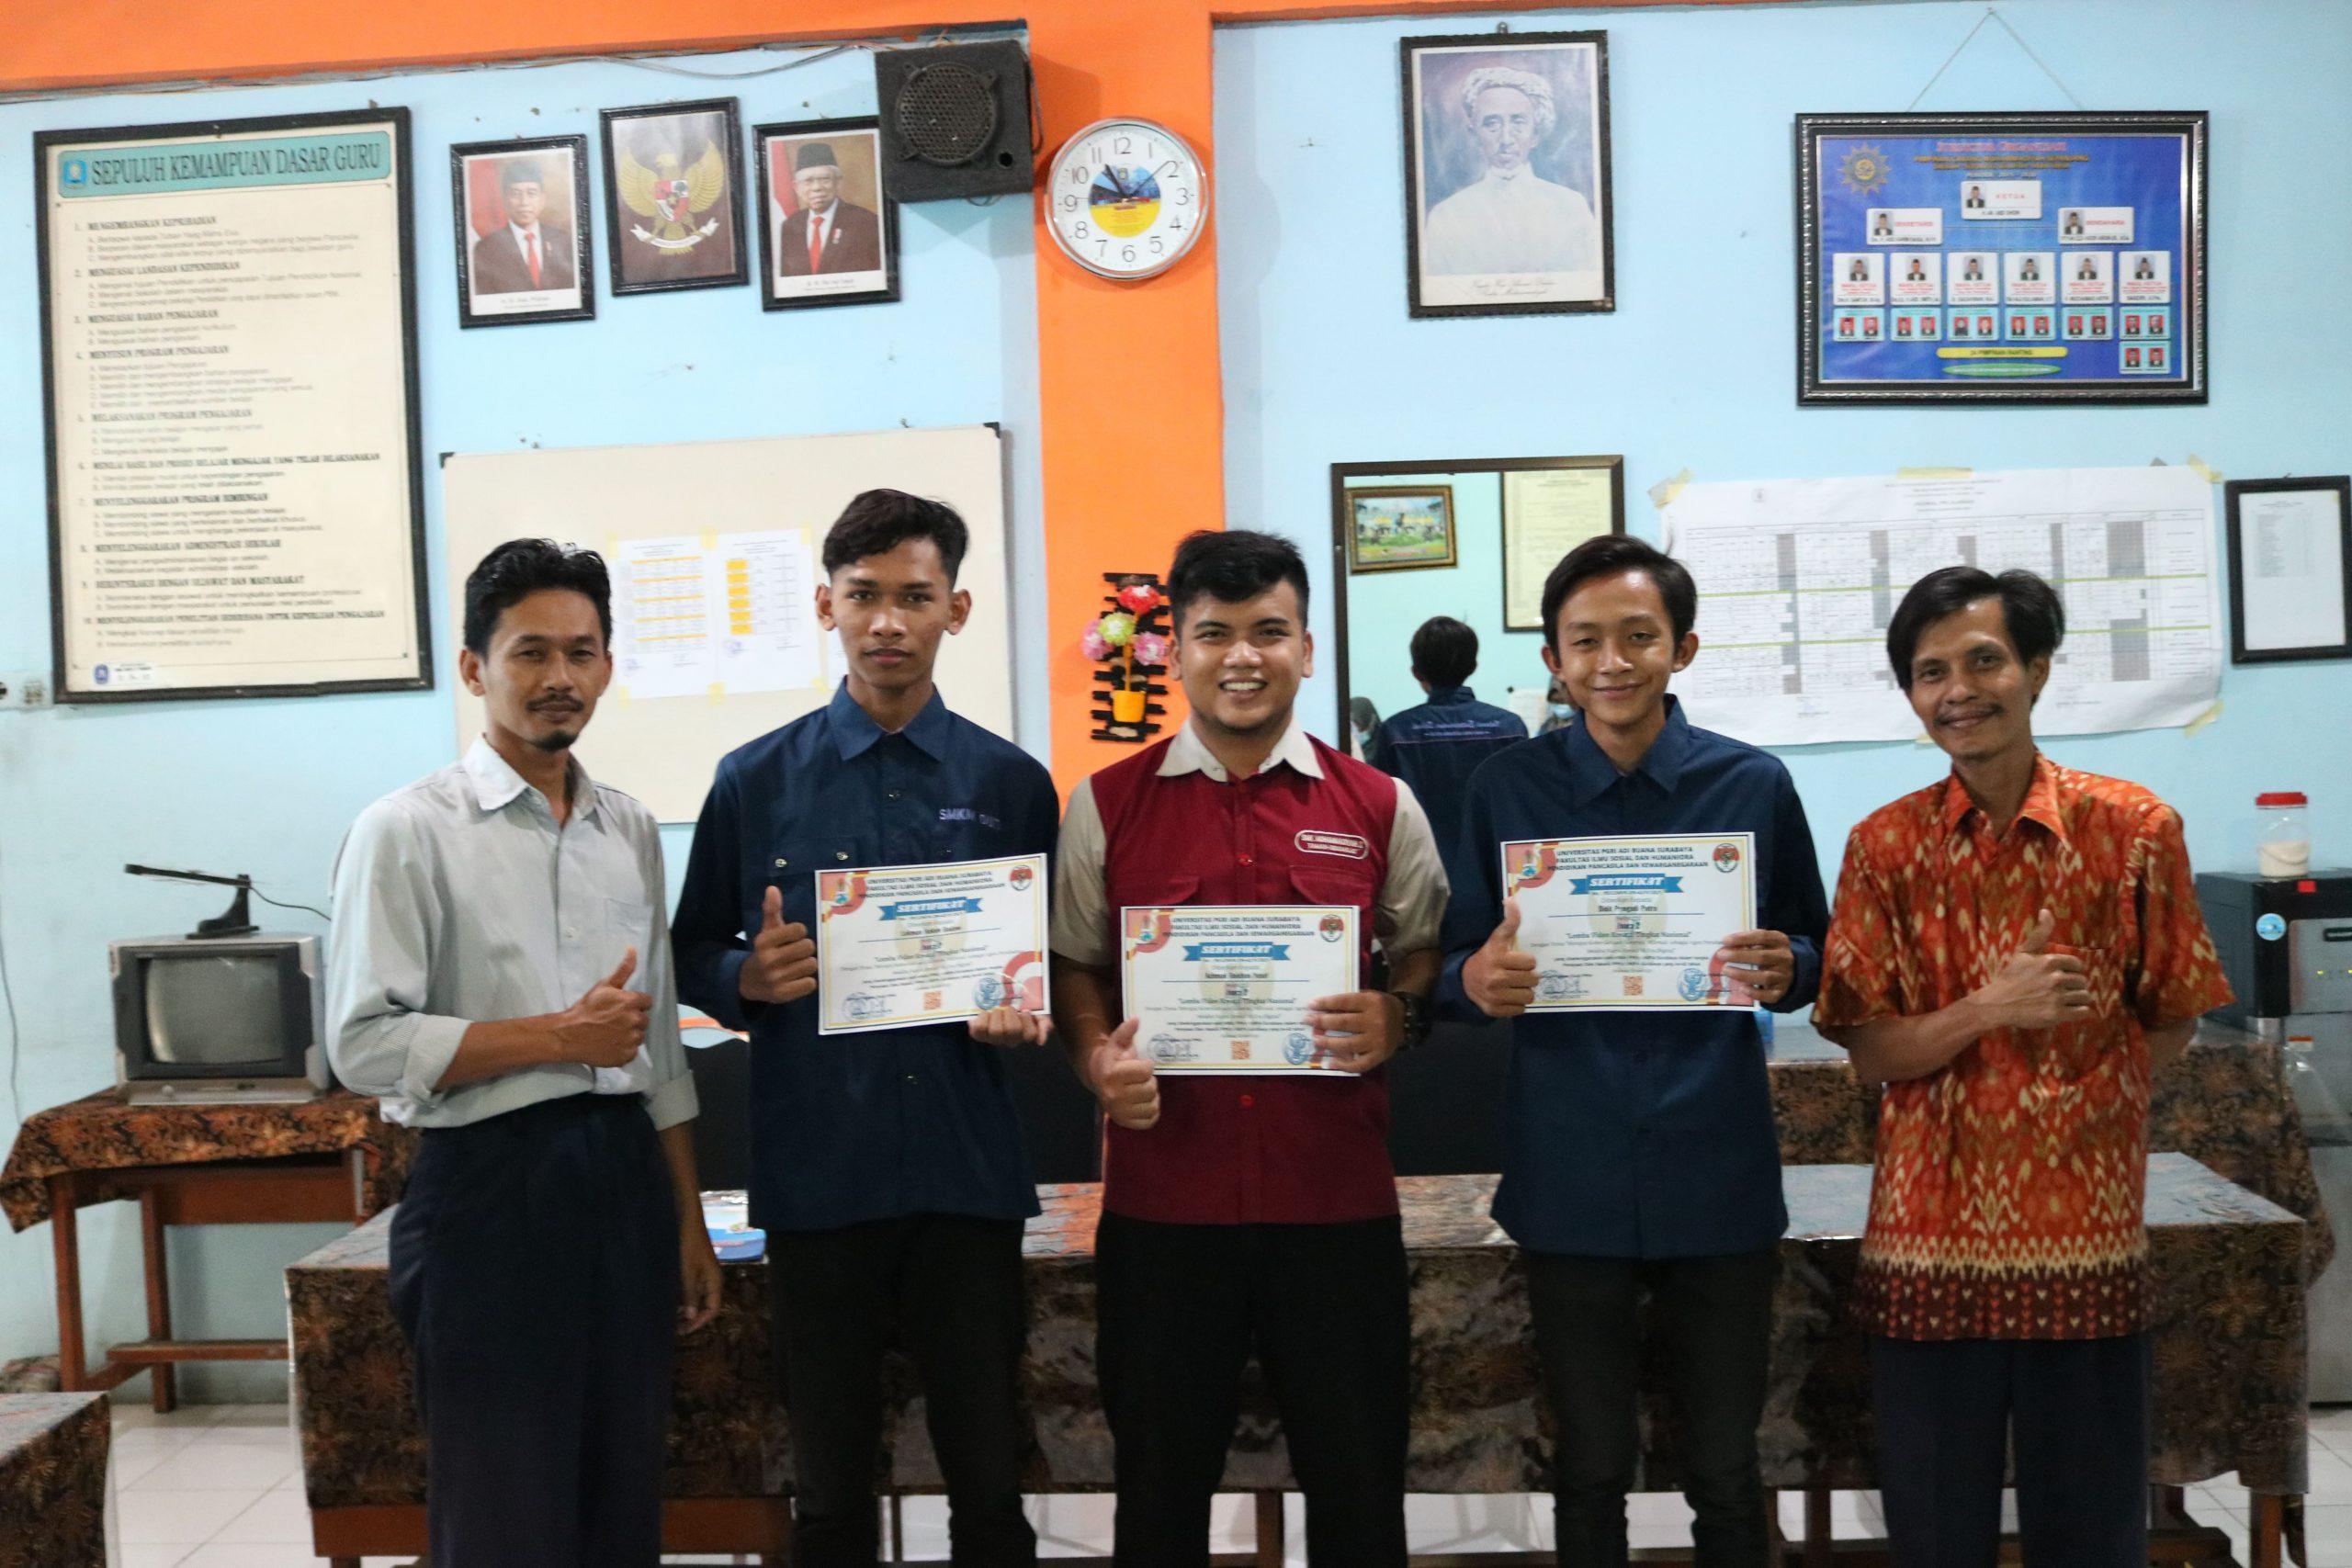 Inspiratif! IPM SMK Muhammadiyah 2 Taman Menangkan Dua Kejuaraan Tingkat Nasional